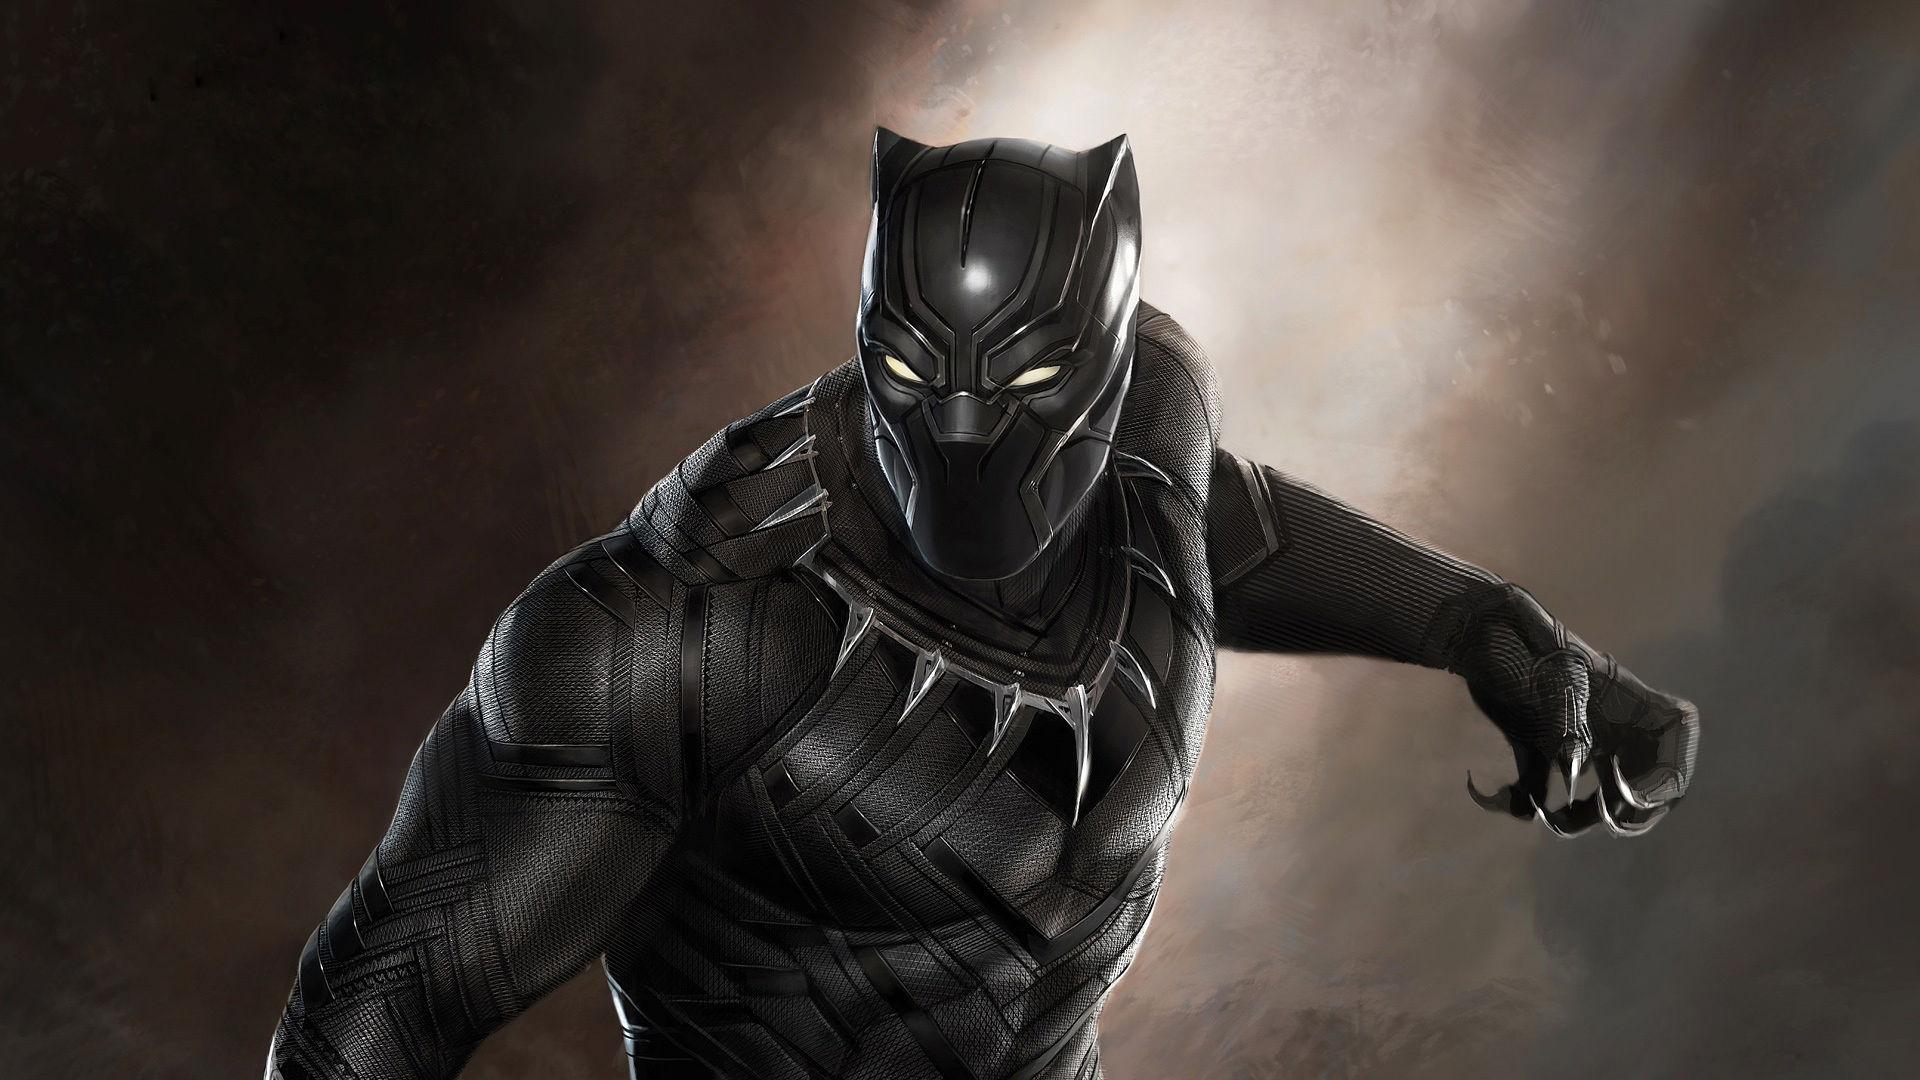 Revelados primeros detalles de la película de Black Panther